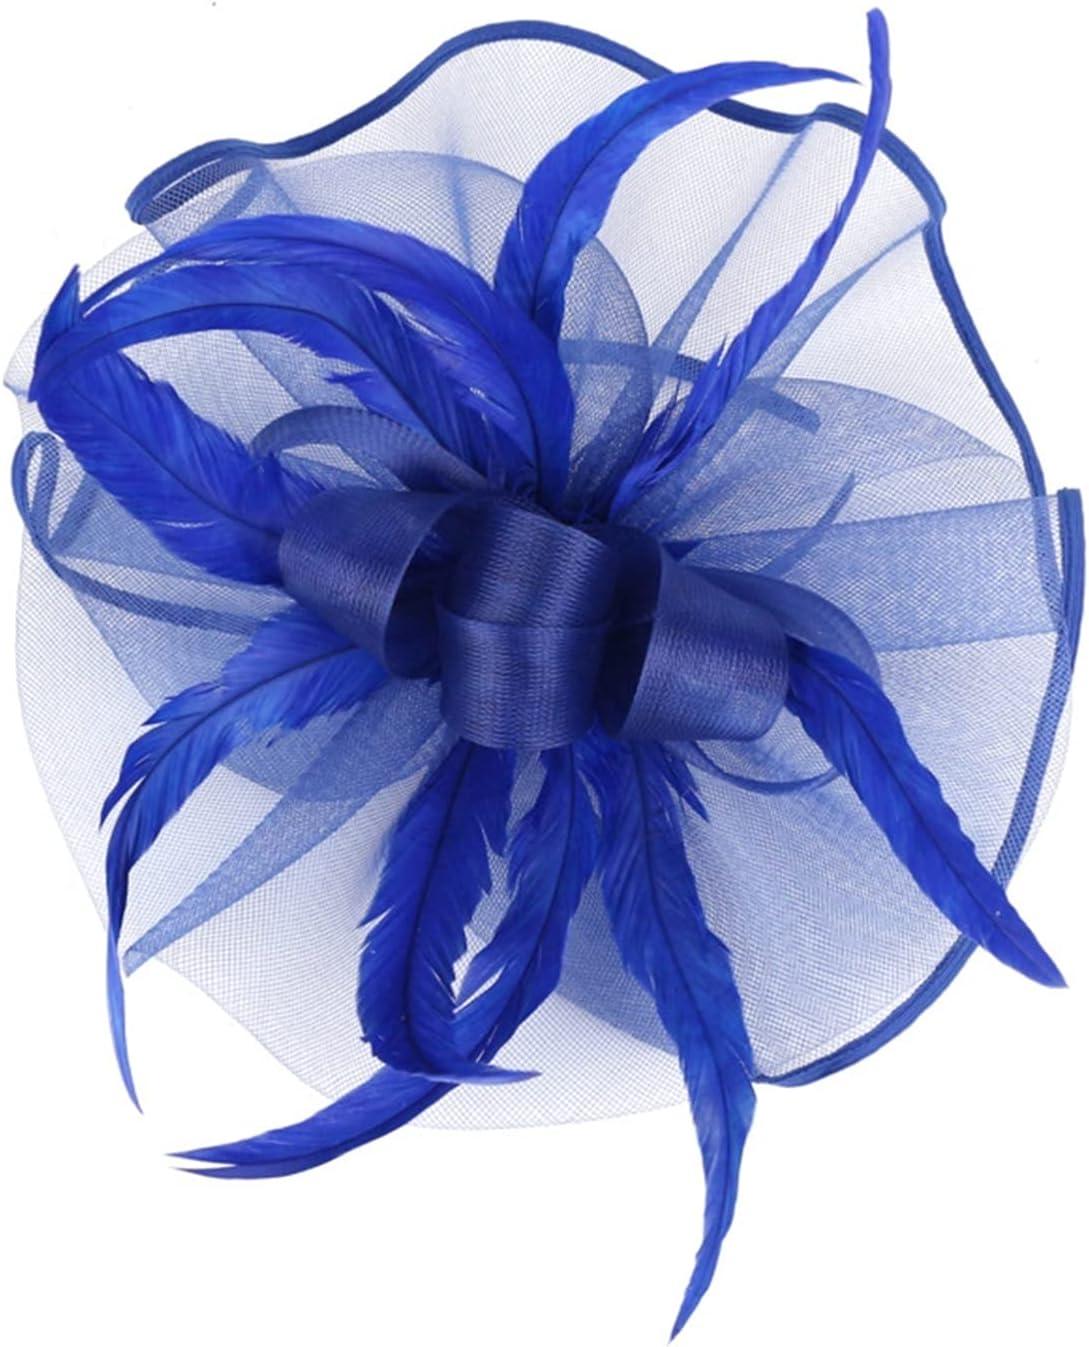 HYMD Tea Party Hats 1PC Women Flower Mesh Feathers Hat Cocktail Tea Party Headbands (Color : 4, Size : One Size)